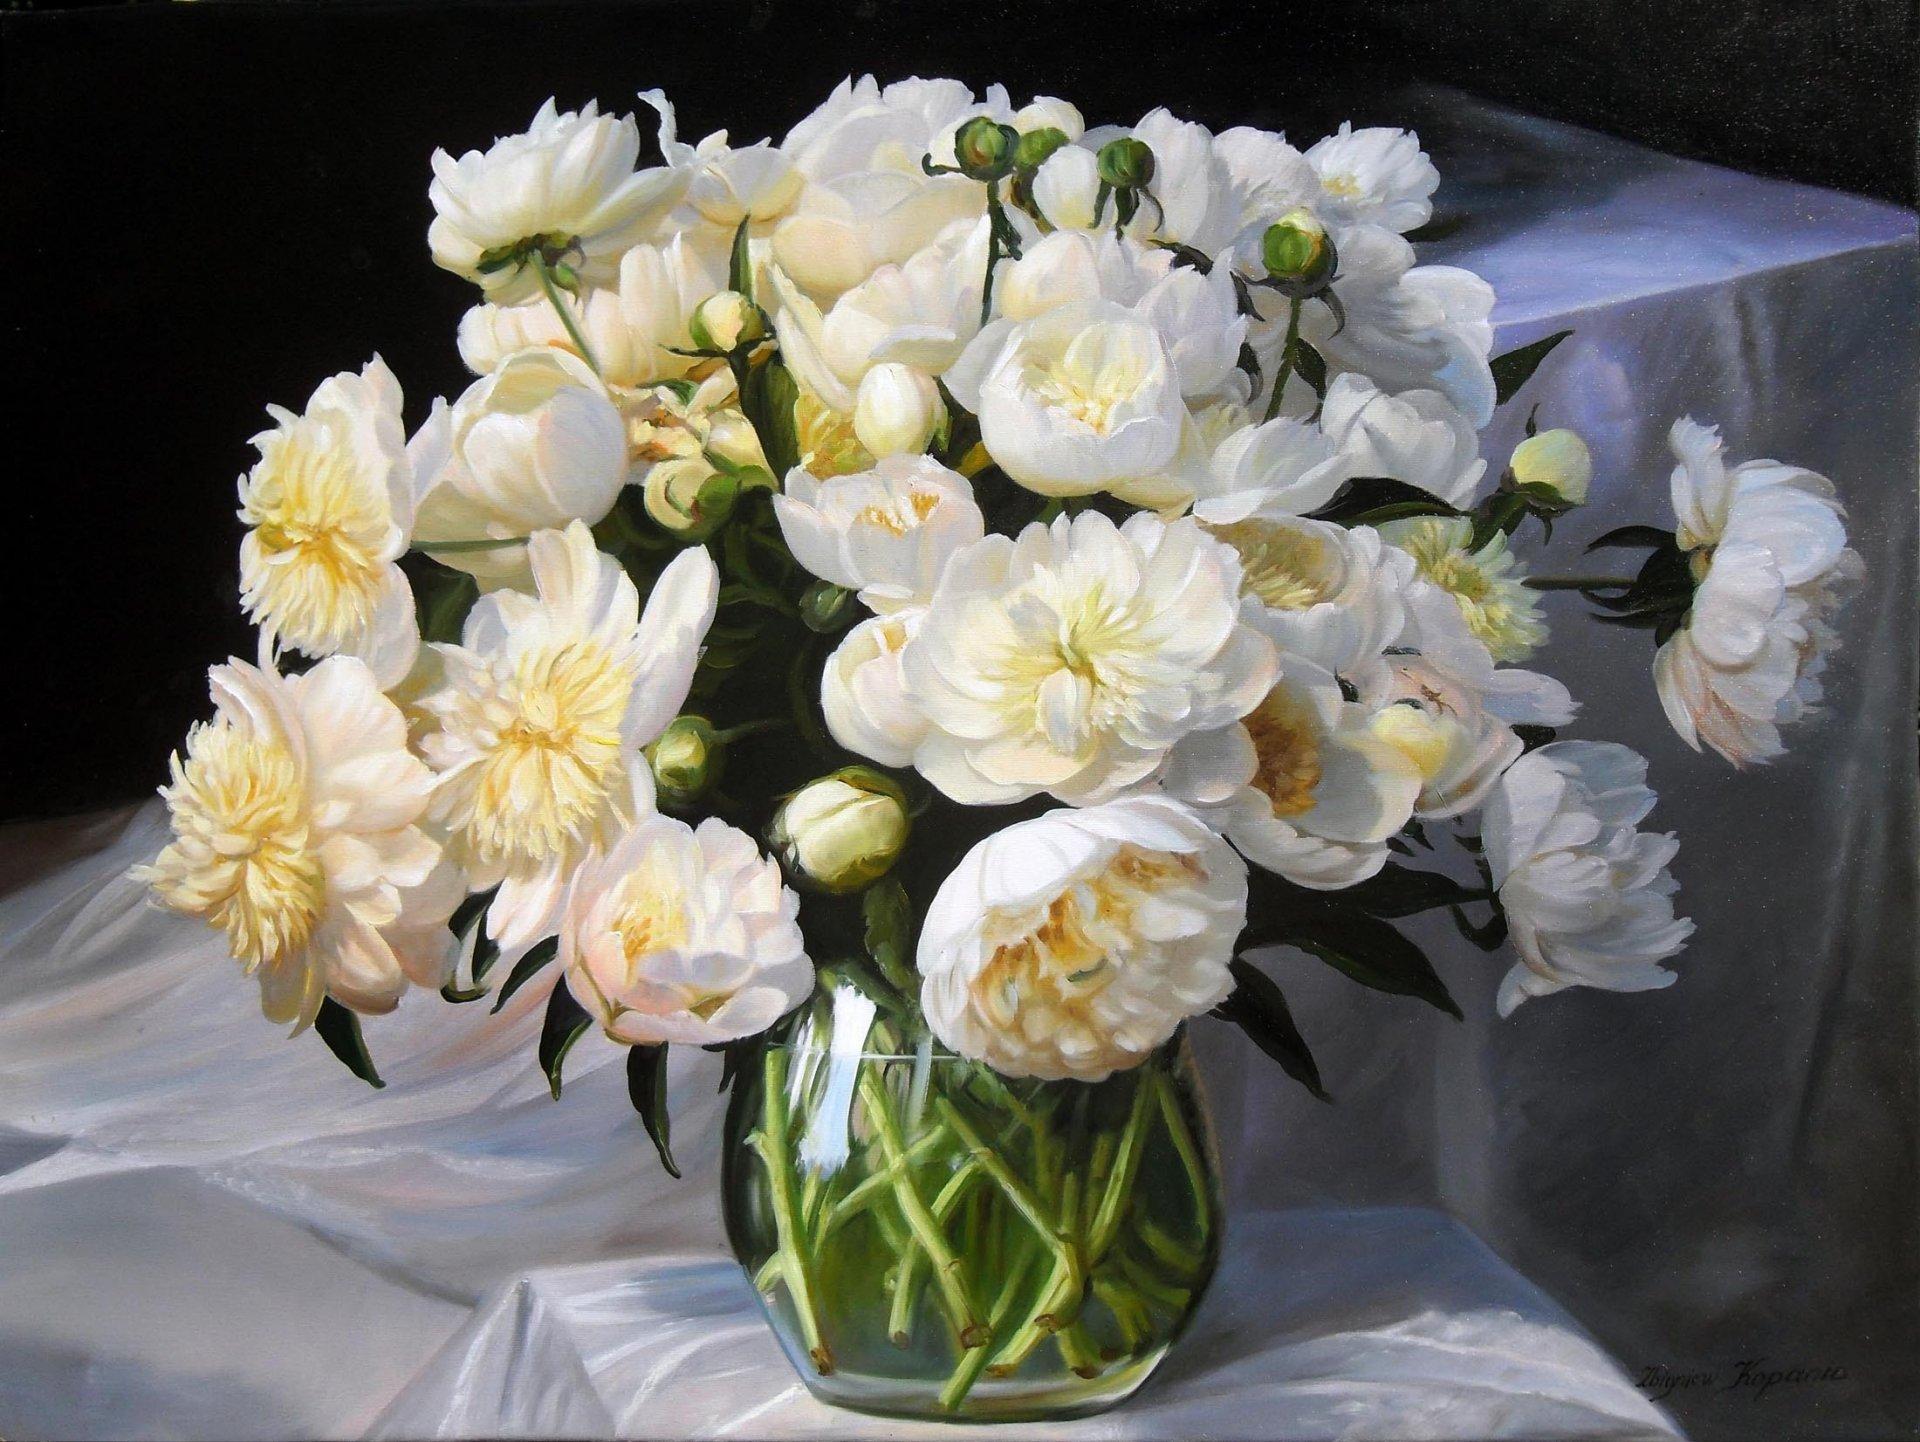 обои на телефон цветы в вазе